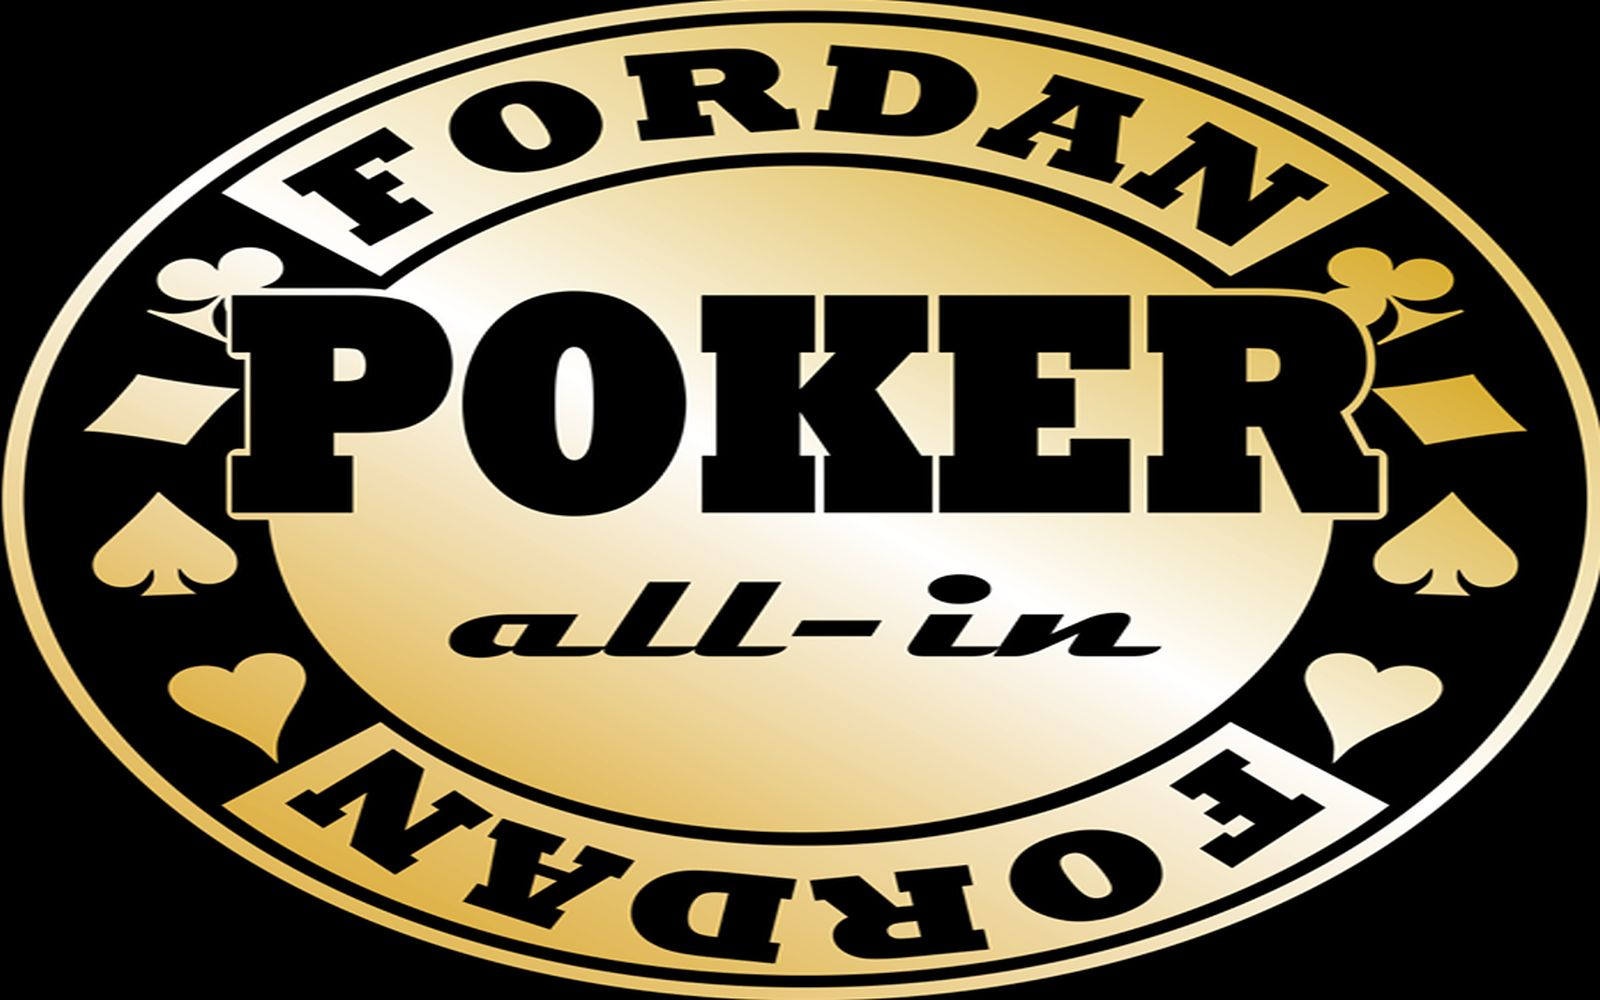 Fordan Poker Club